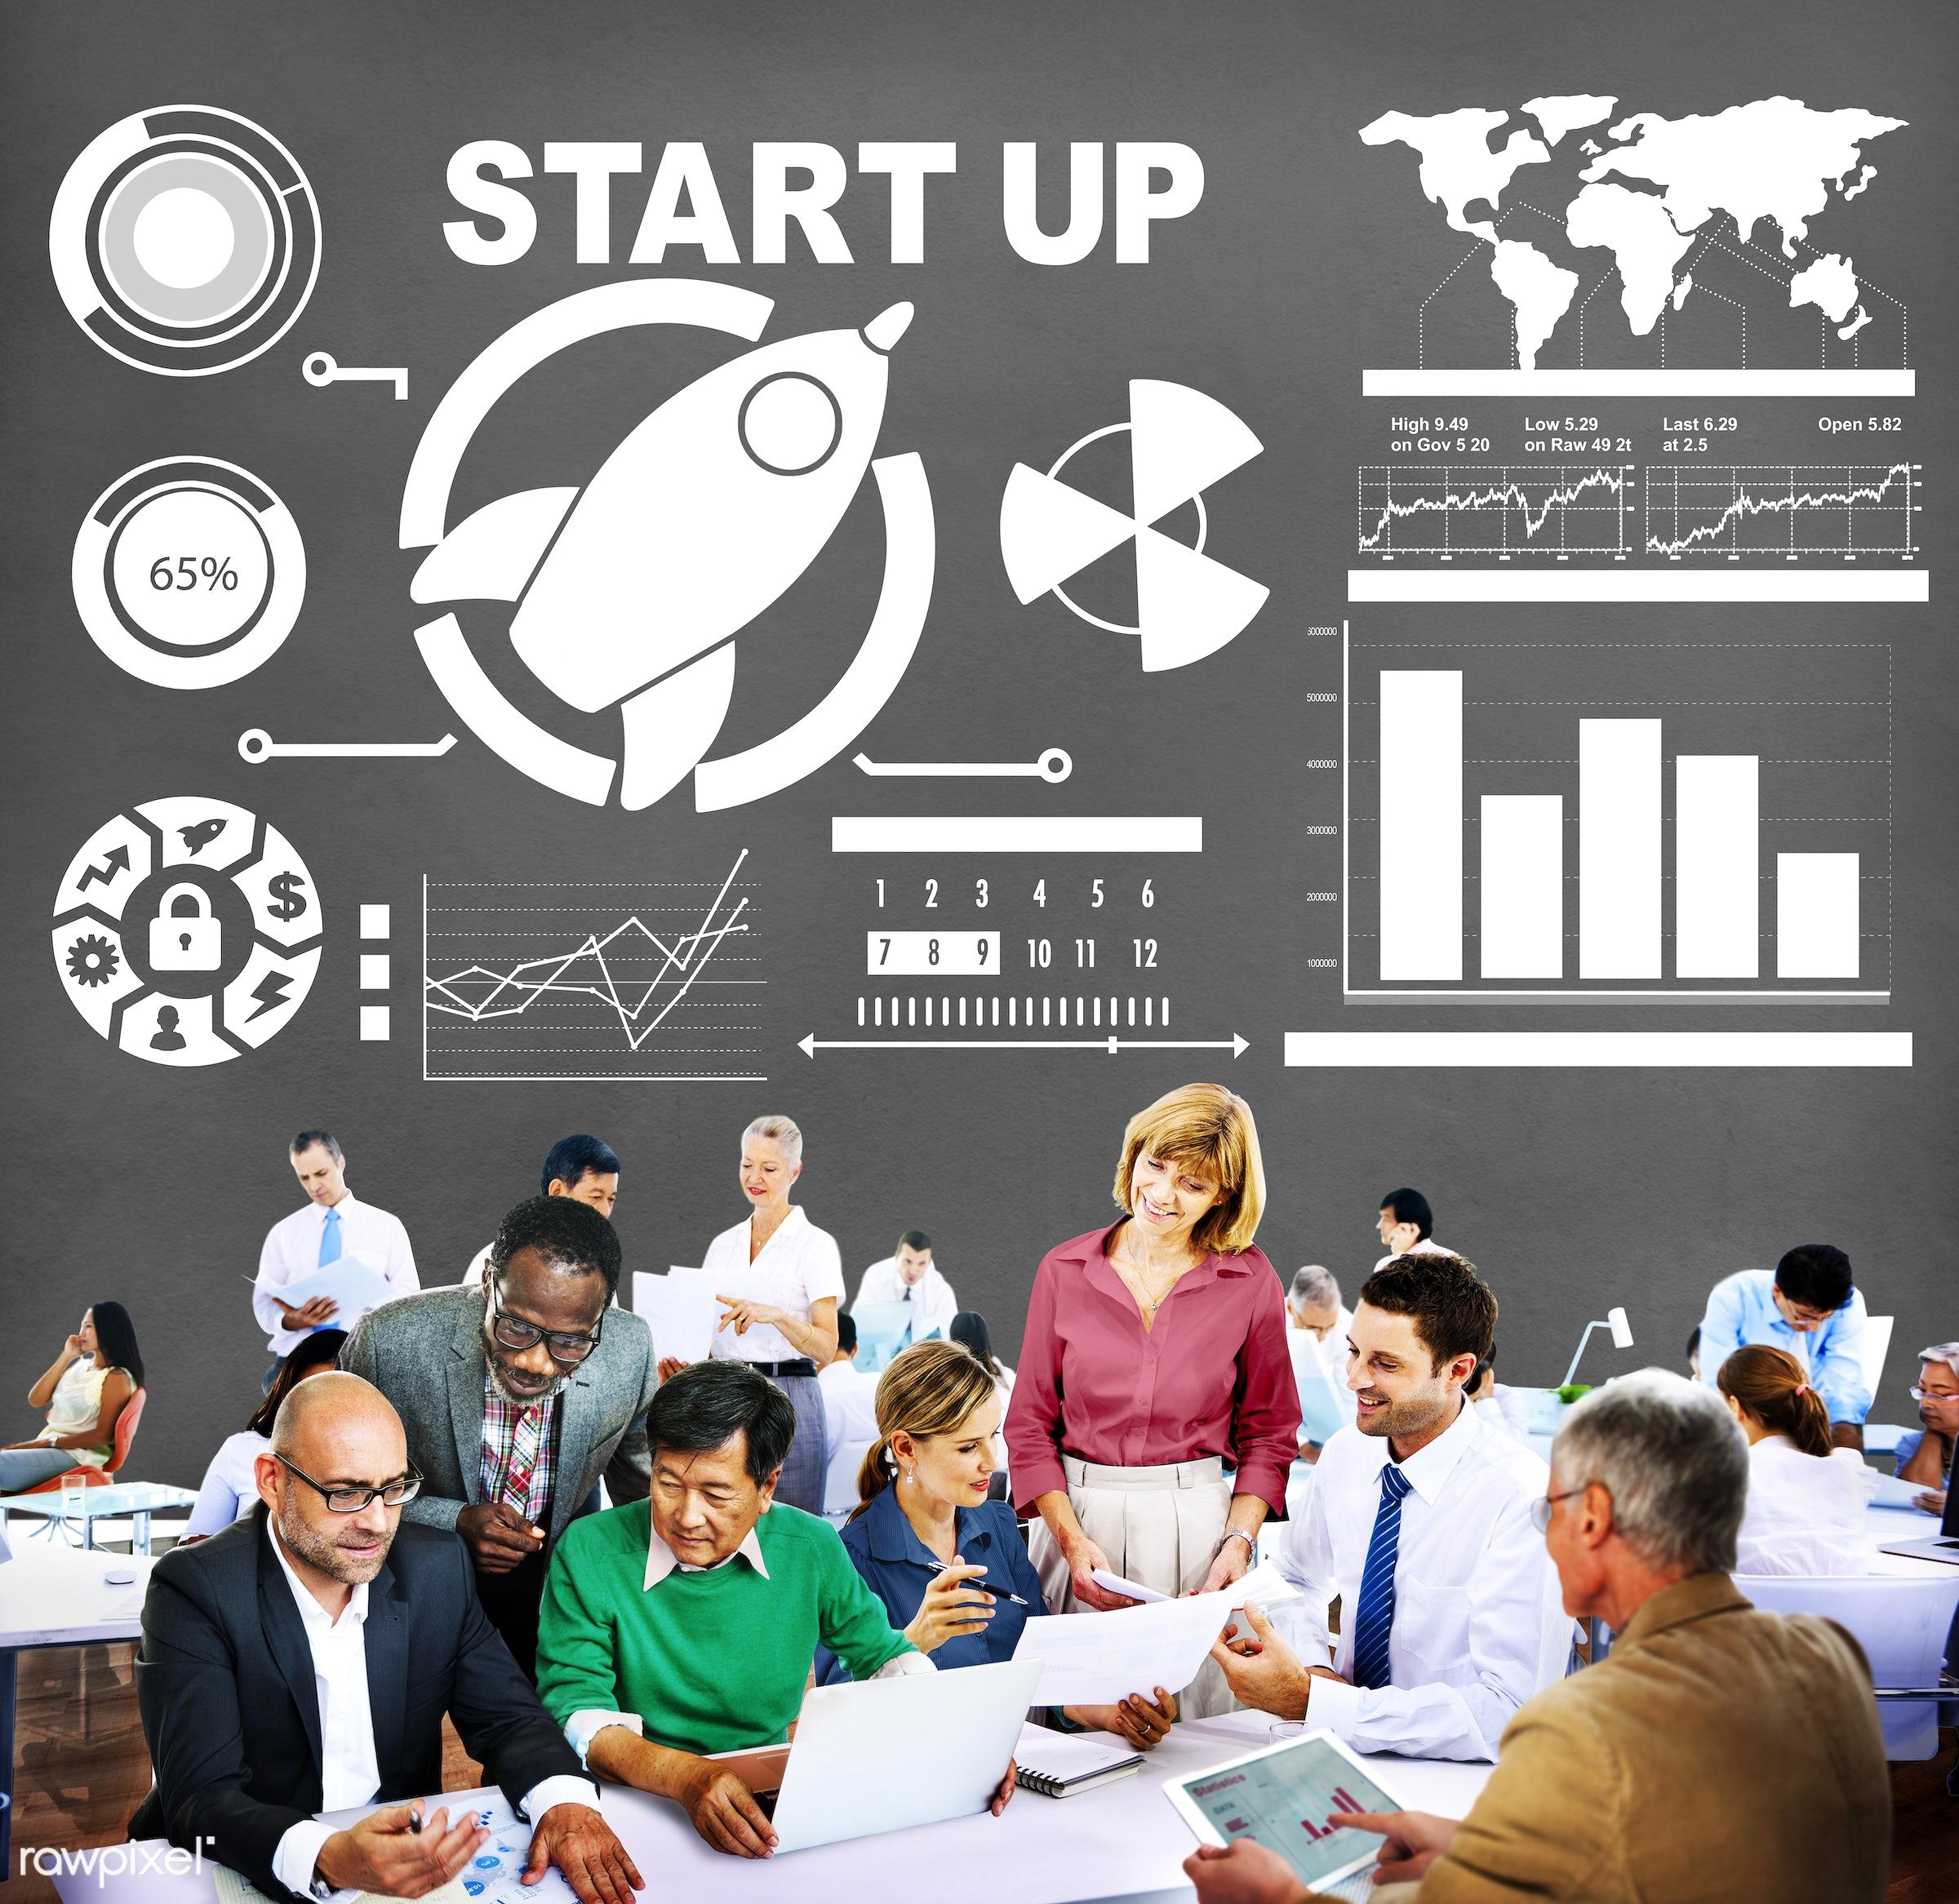 analysis, bar graph, business, business people, business plan, businessmen, businesswomen, busy, challenge, communication,...